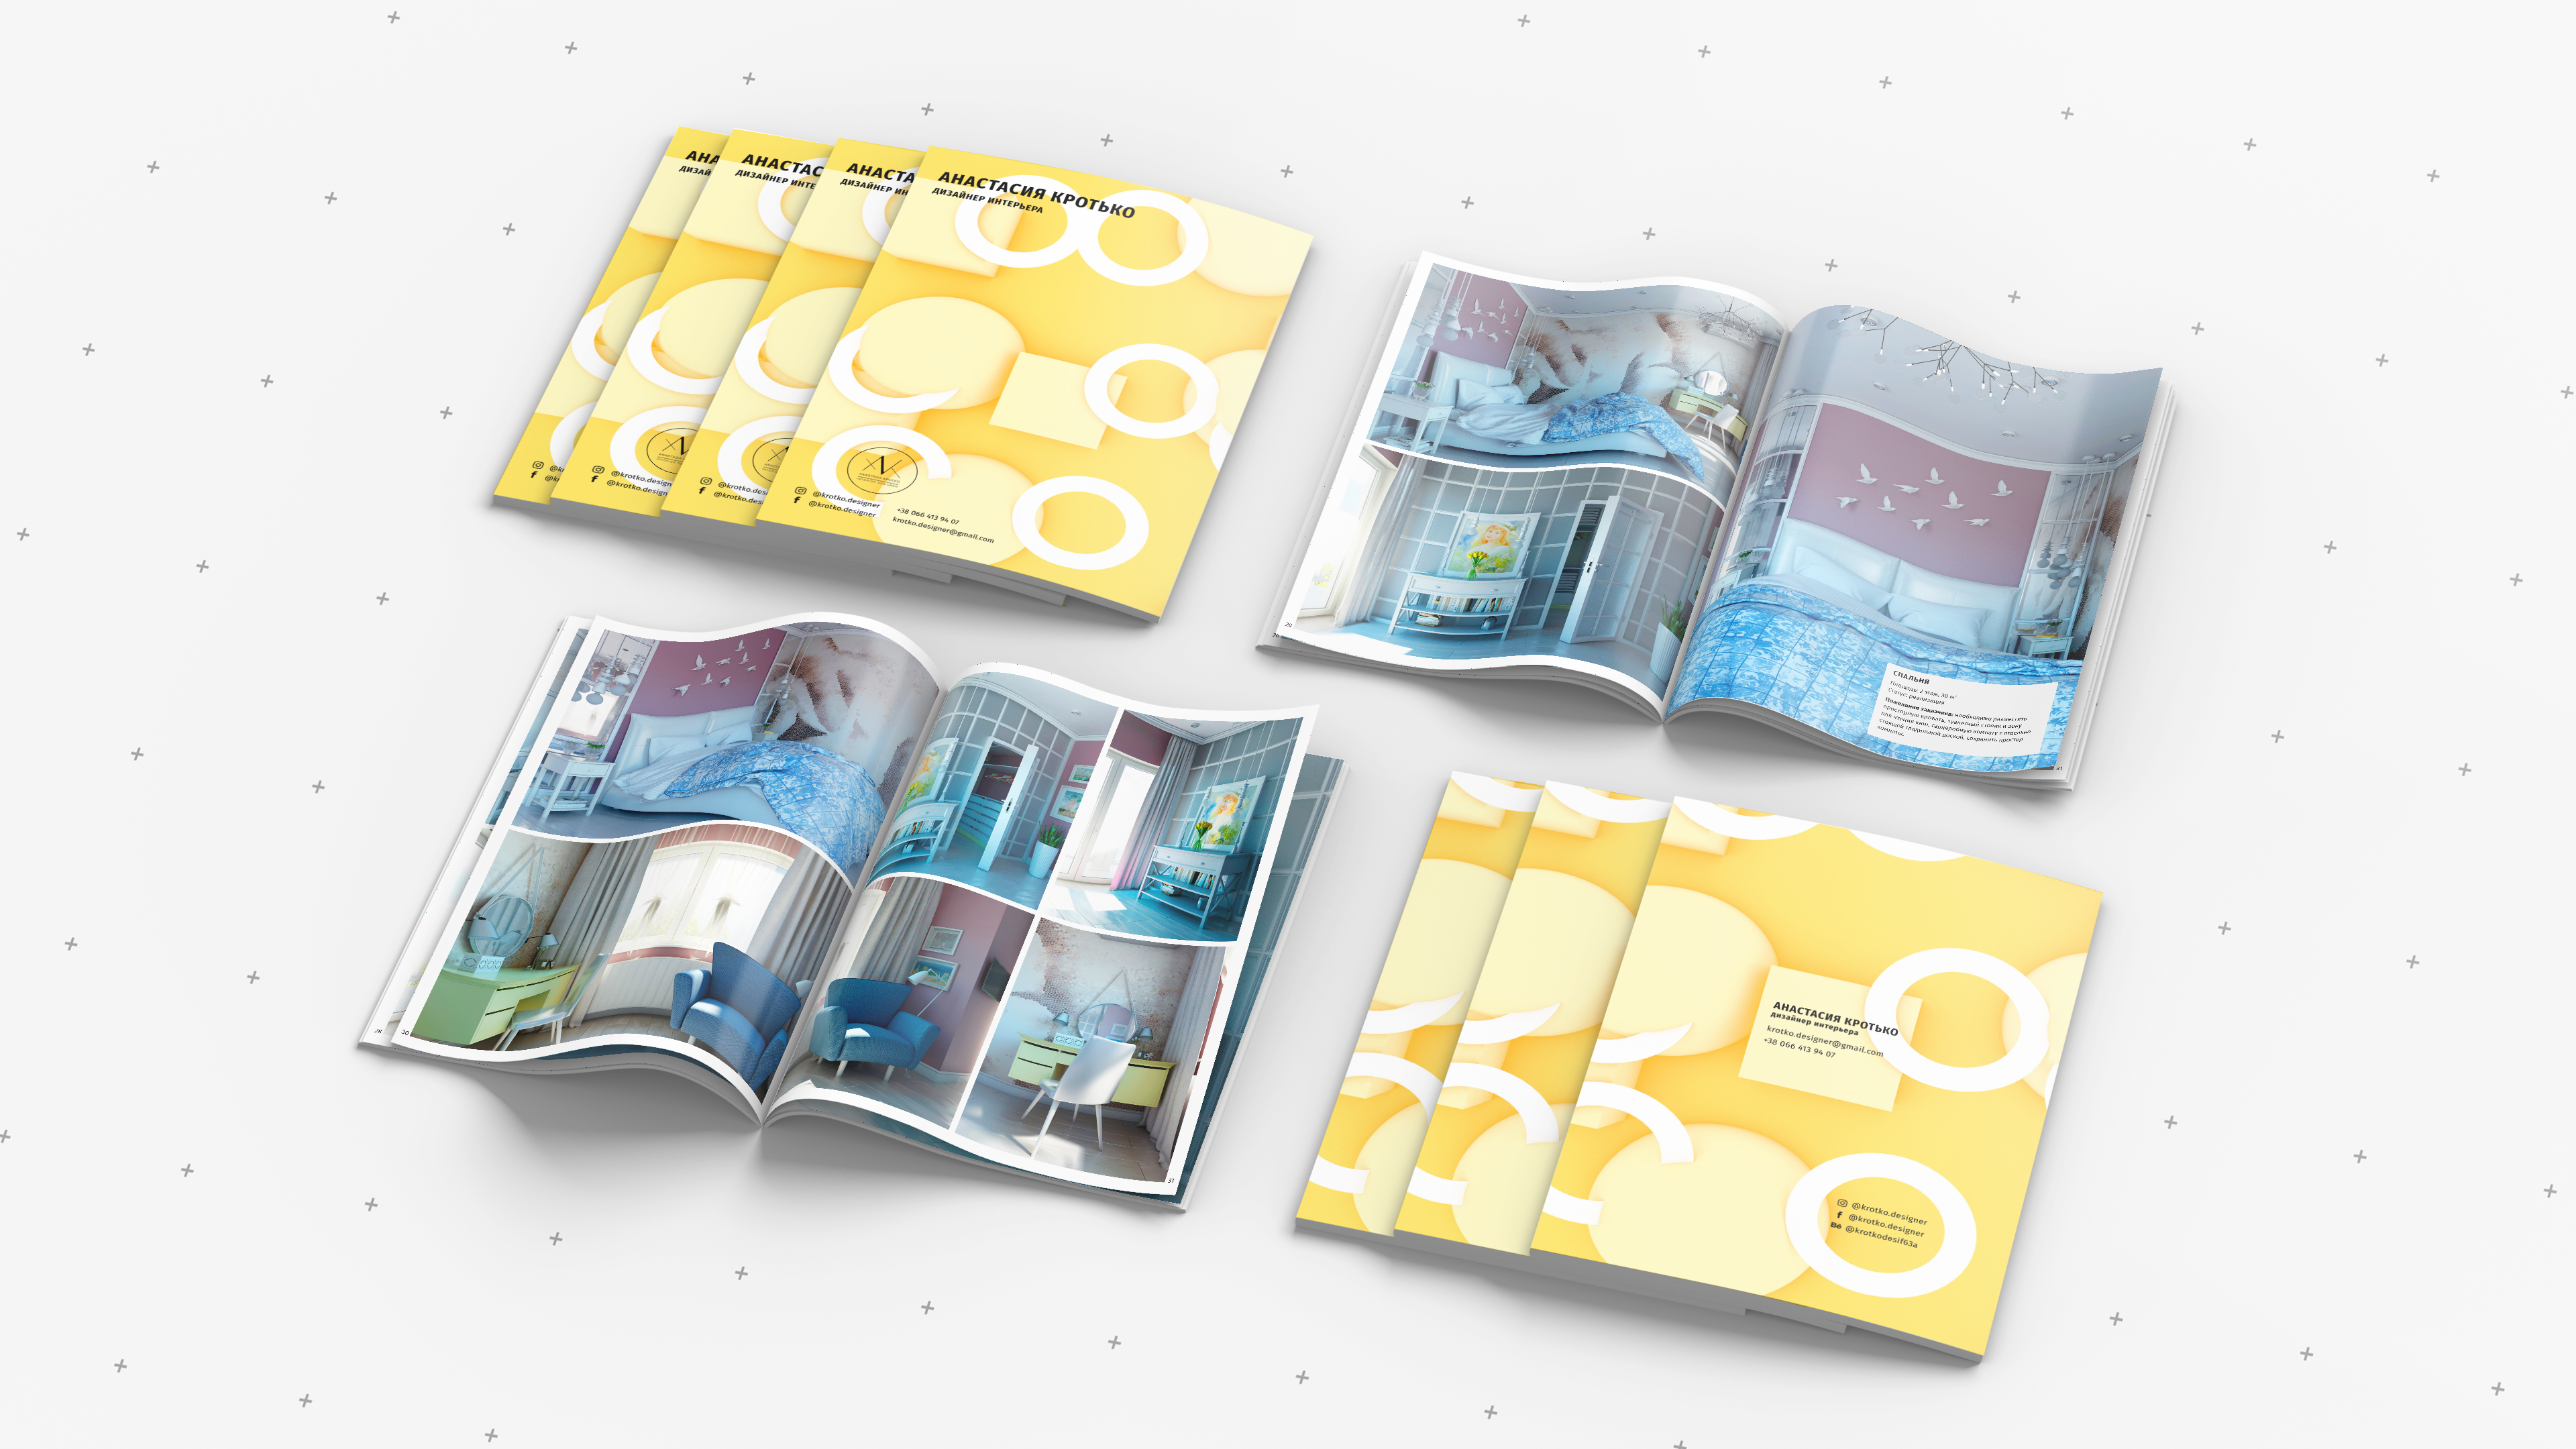 Alla Seleznova - PDF PORTFOLIO FOR INTERIOR DESIGNER